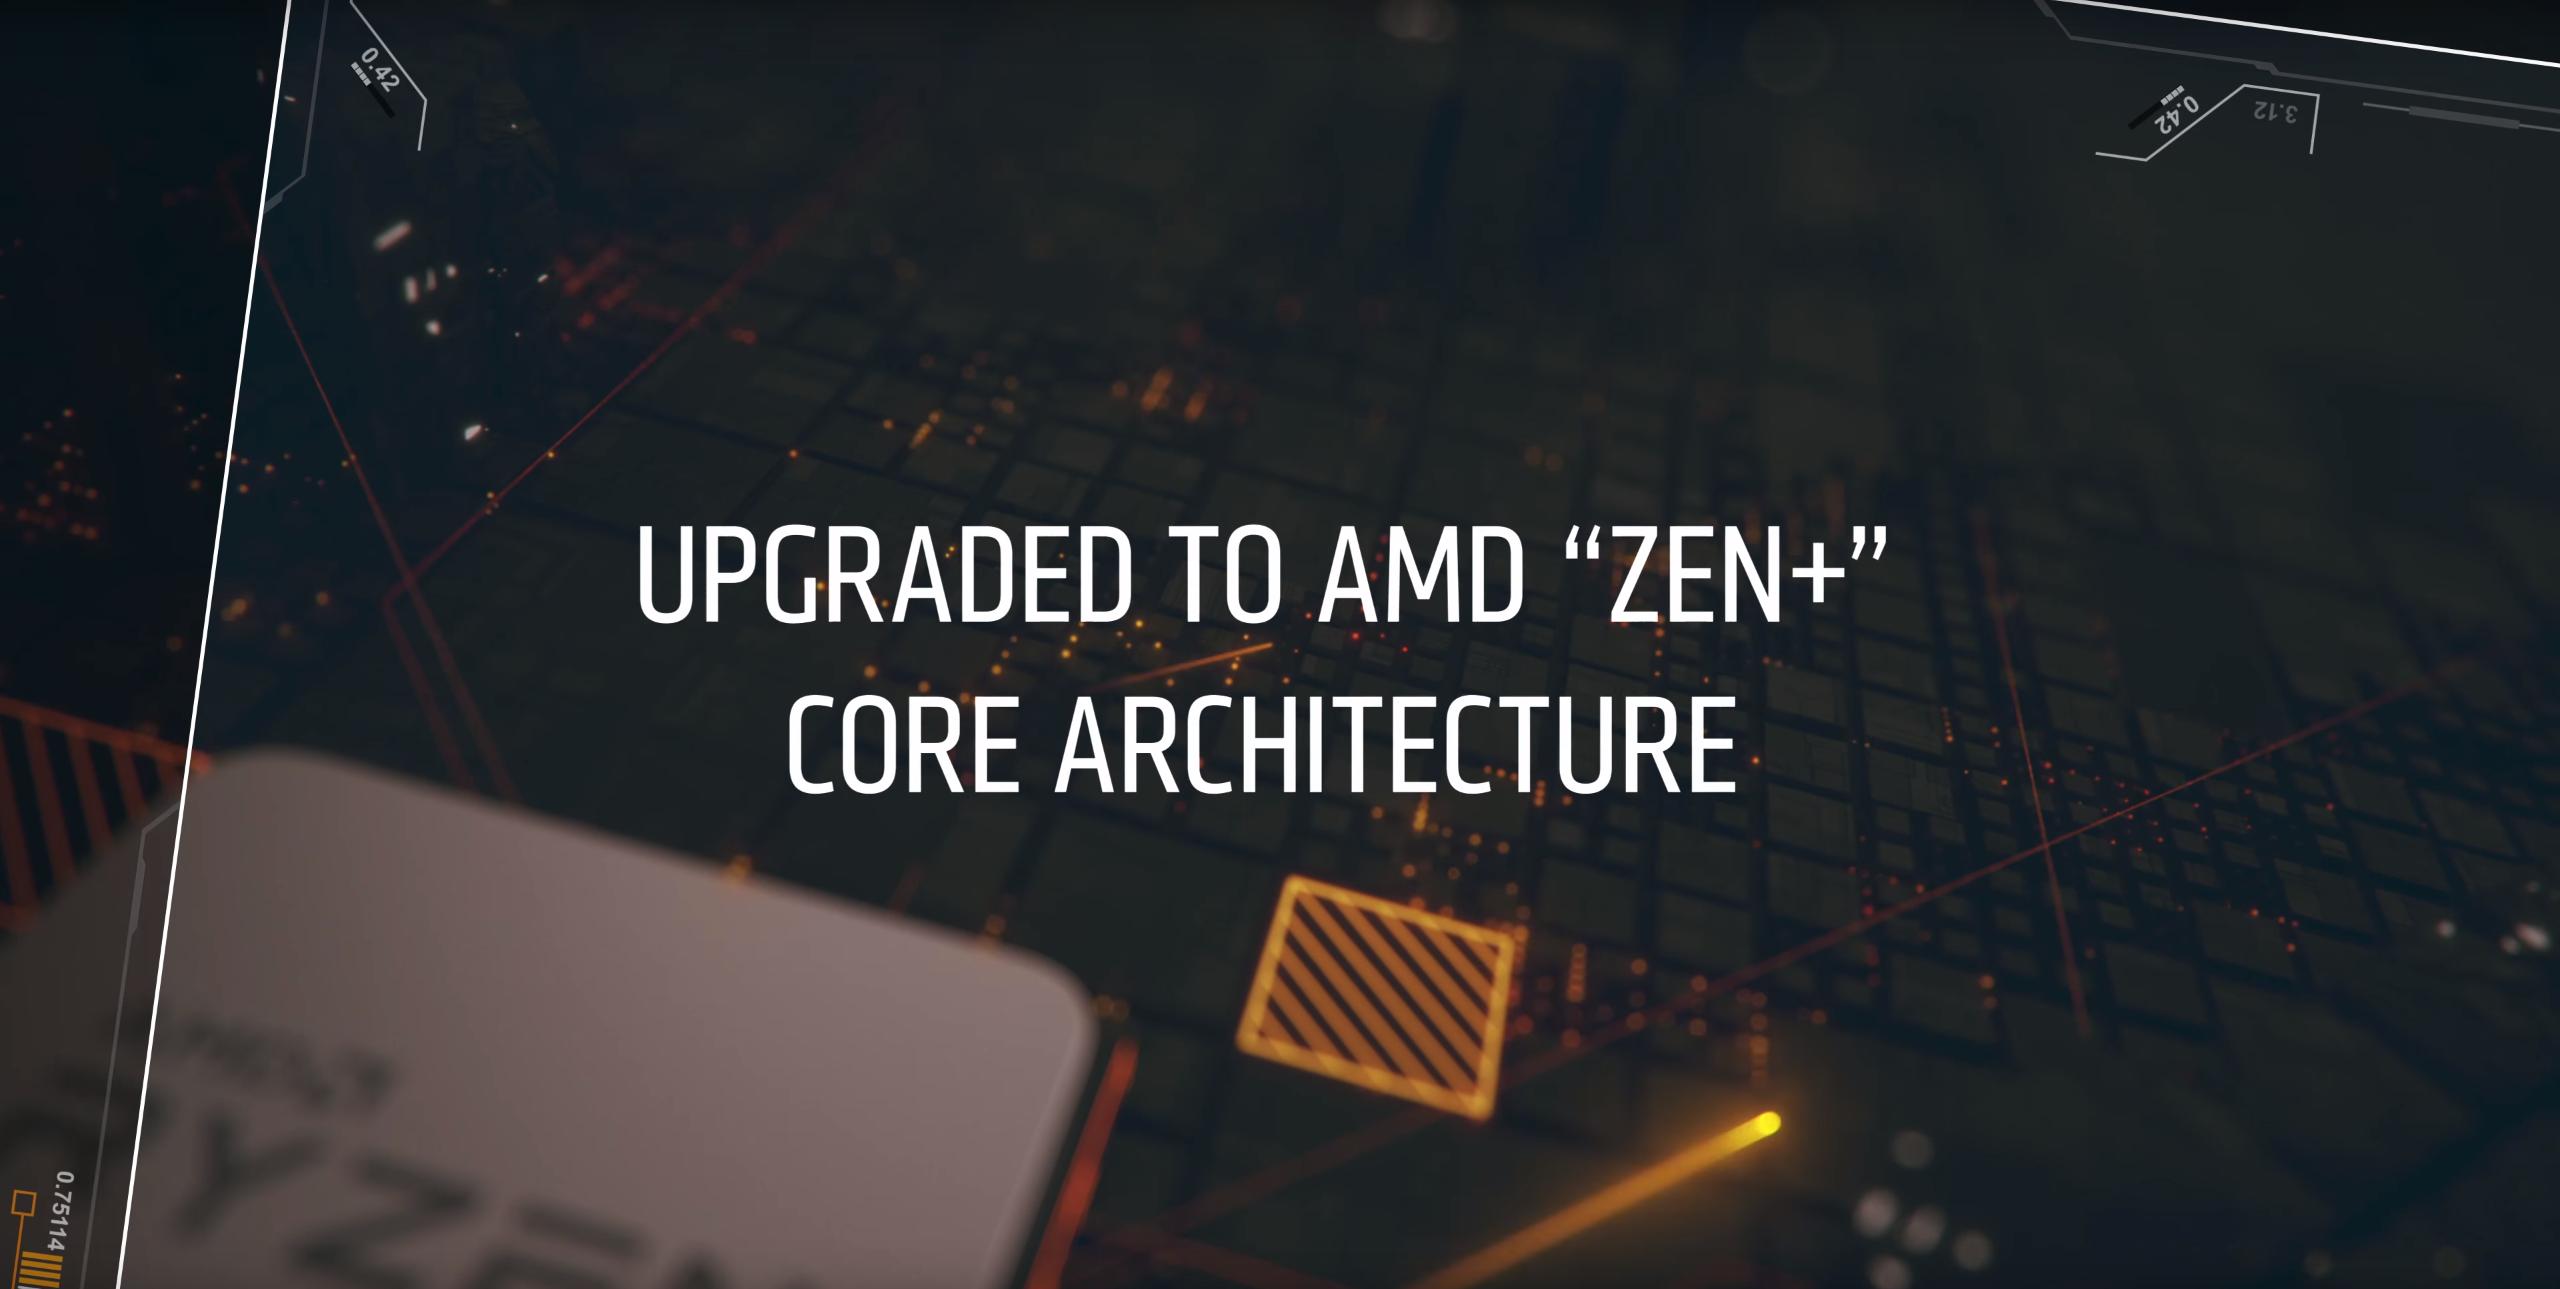 AMD Ryzen 5 3400G & Ryzen 3 3200G APU Final Specs Detailed